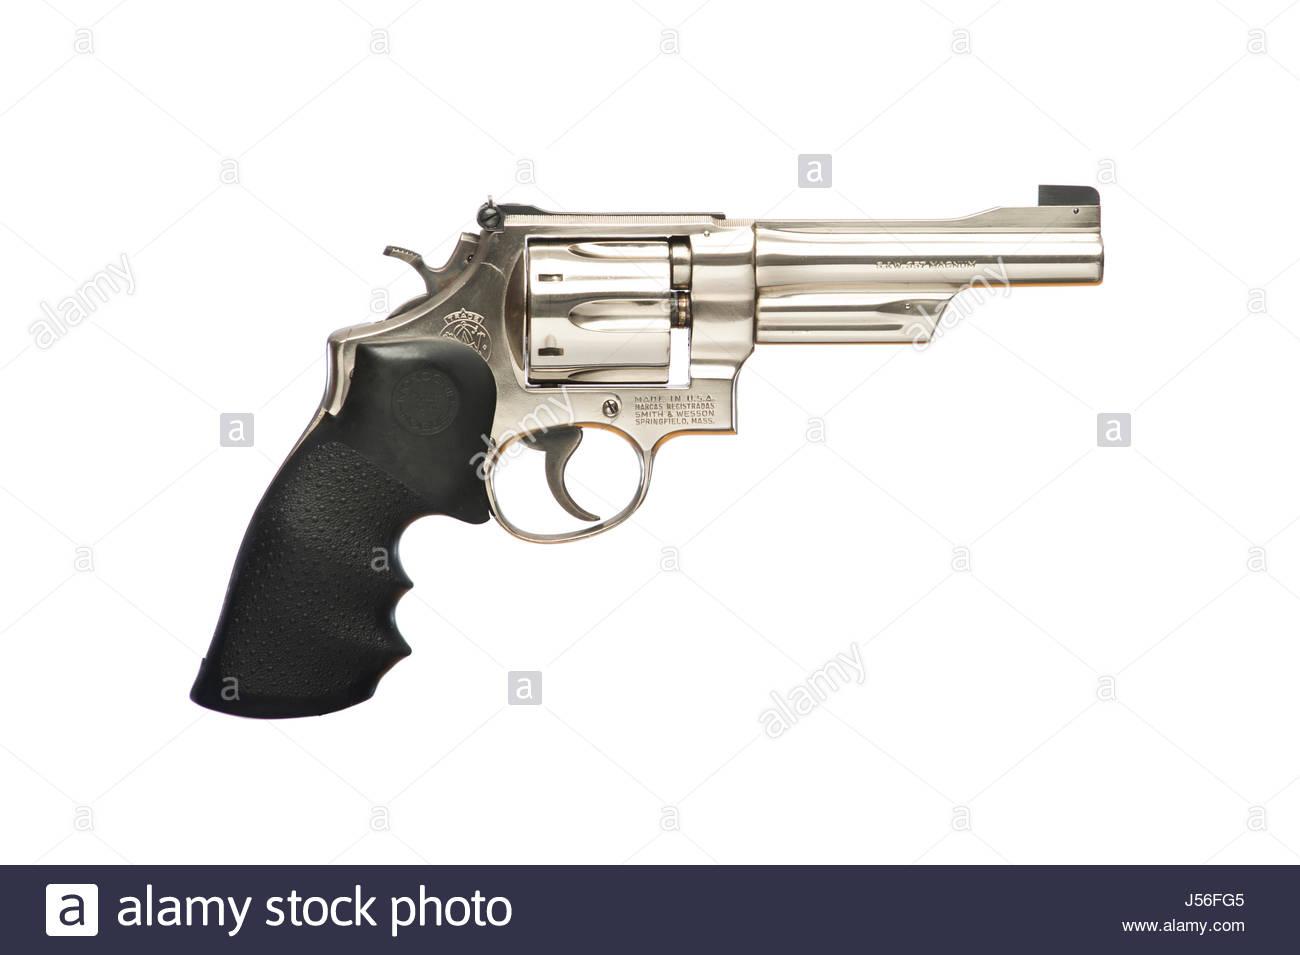 Smith & Wesson Model 27, N Frame, 5 inch barrel revolver pistol ...